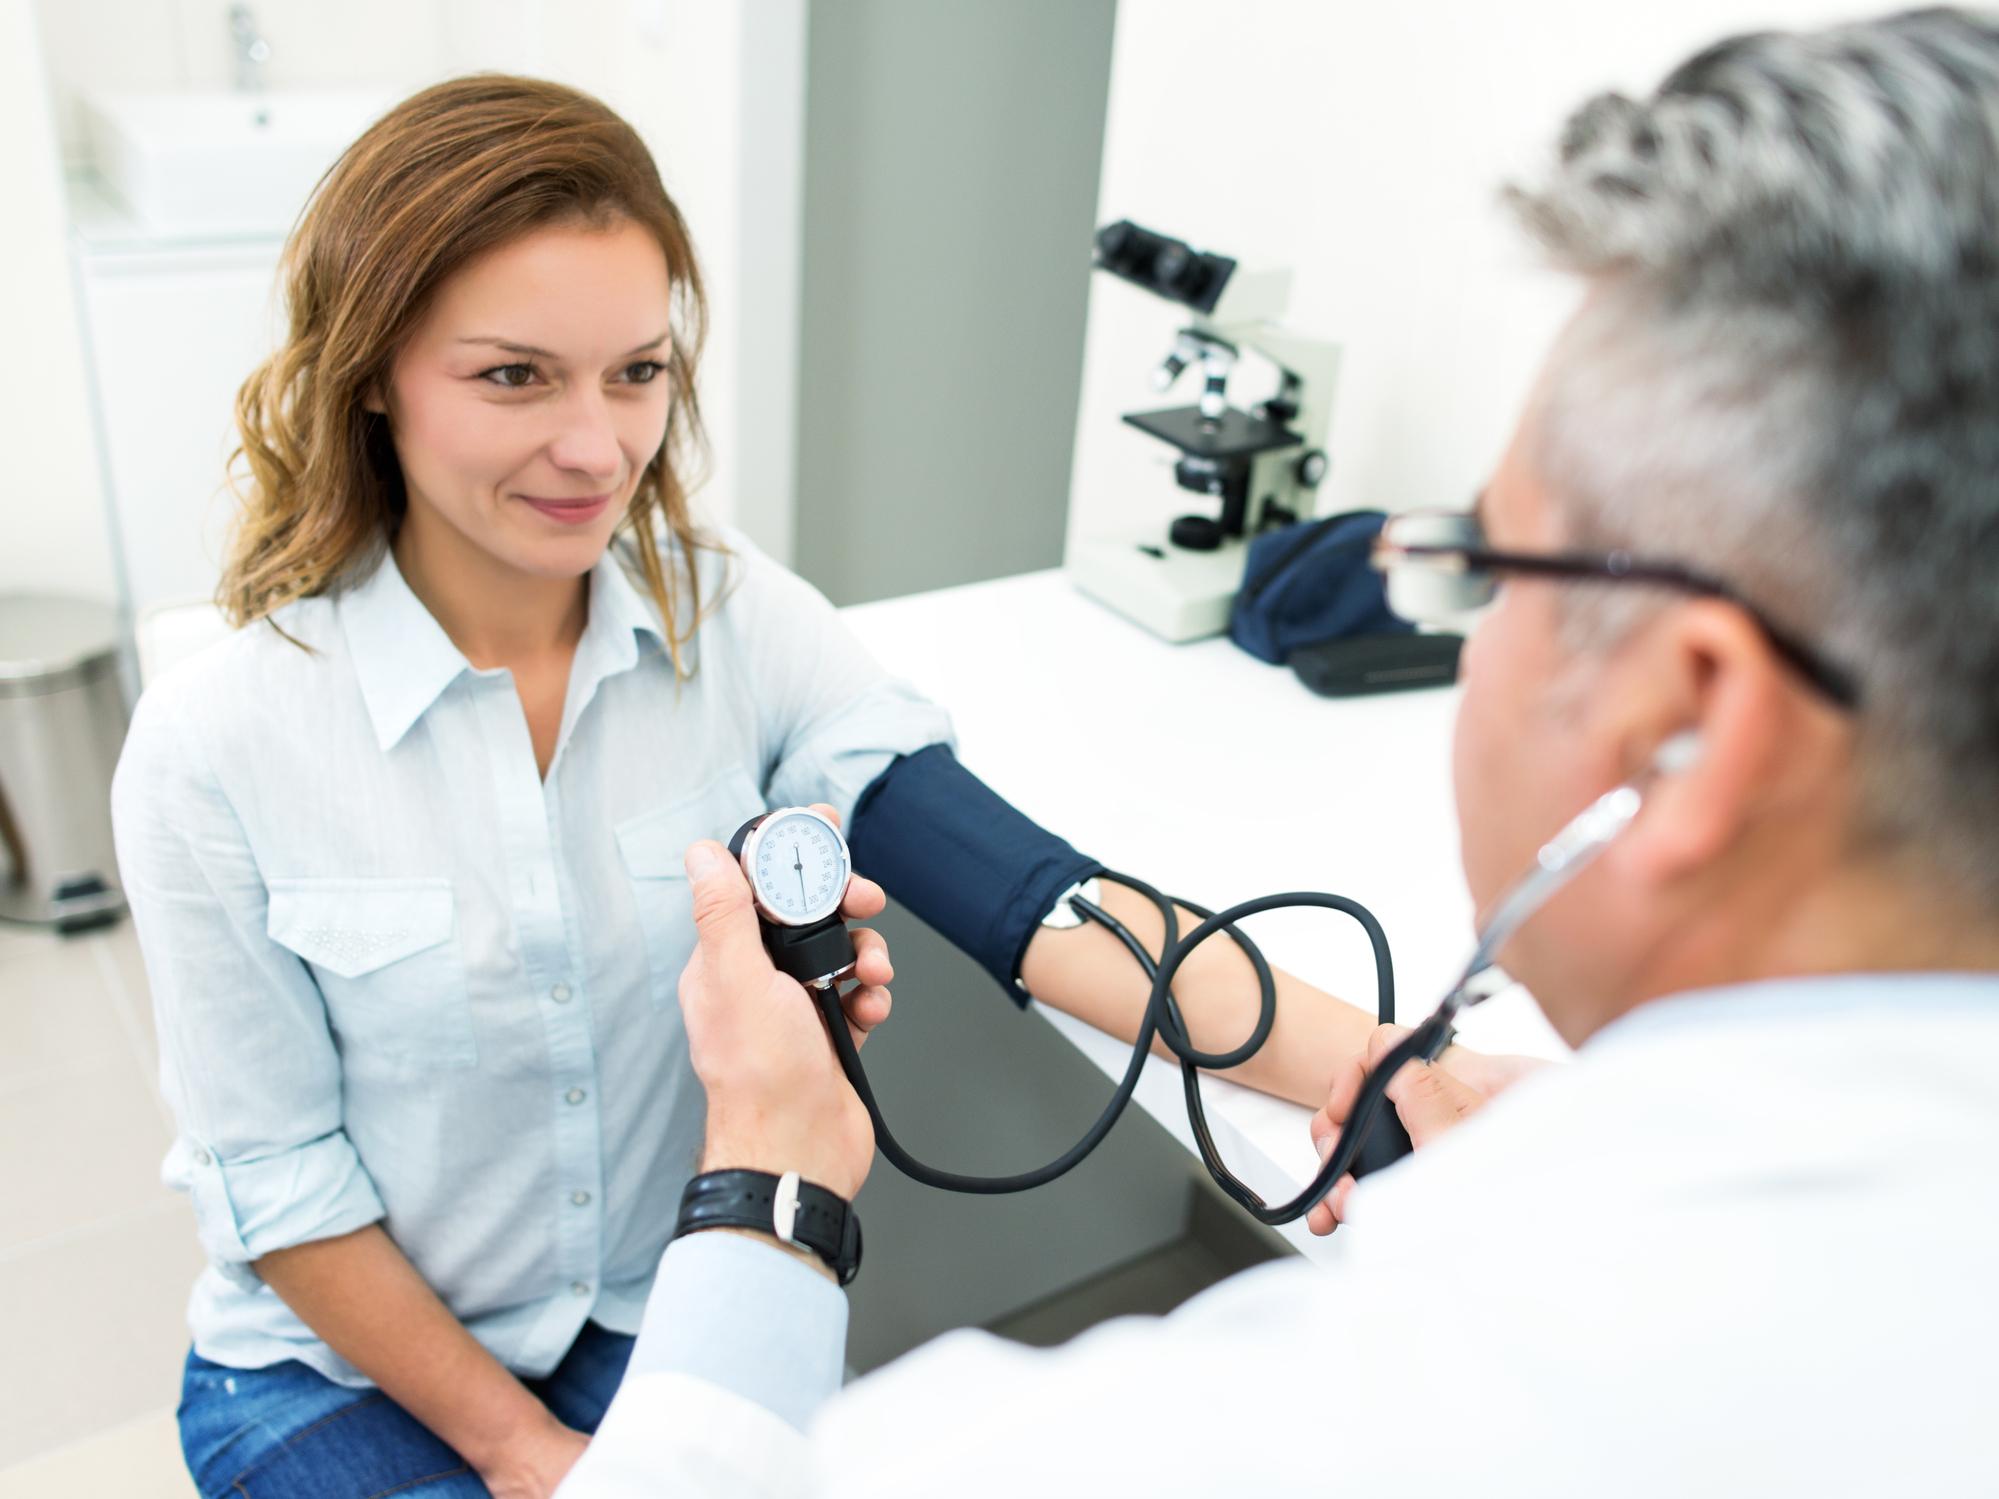 gliatilin magas vérnyomás esetén a 3 stádiumú magas vérnyomás tünetei